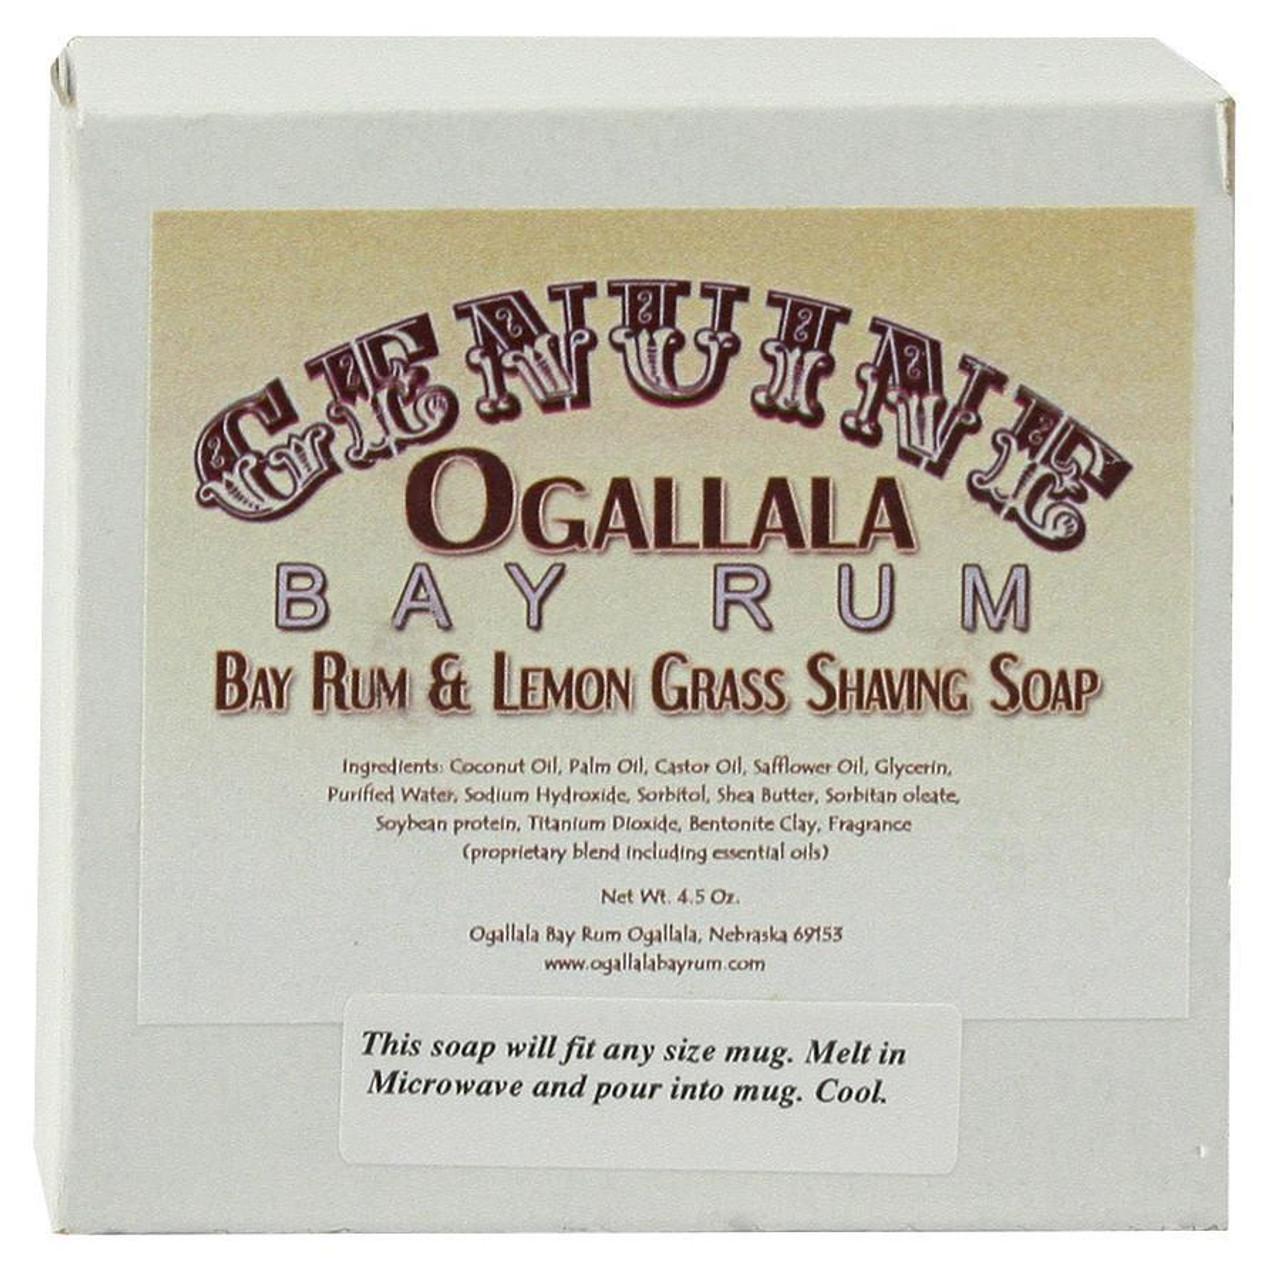 Ogallala Bay Rum & Lemongrass Shave Soap, 4.5oz